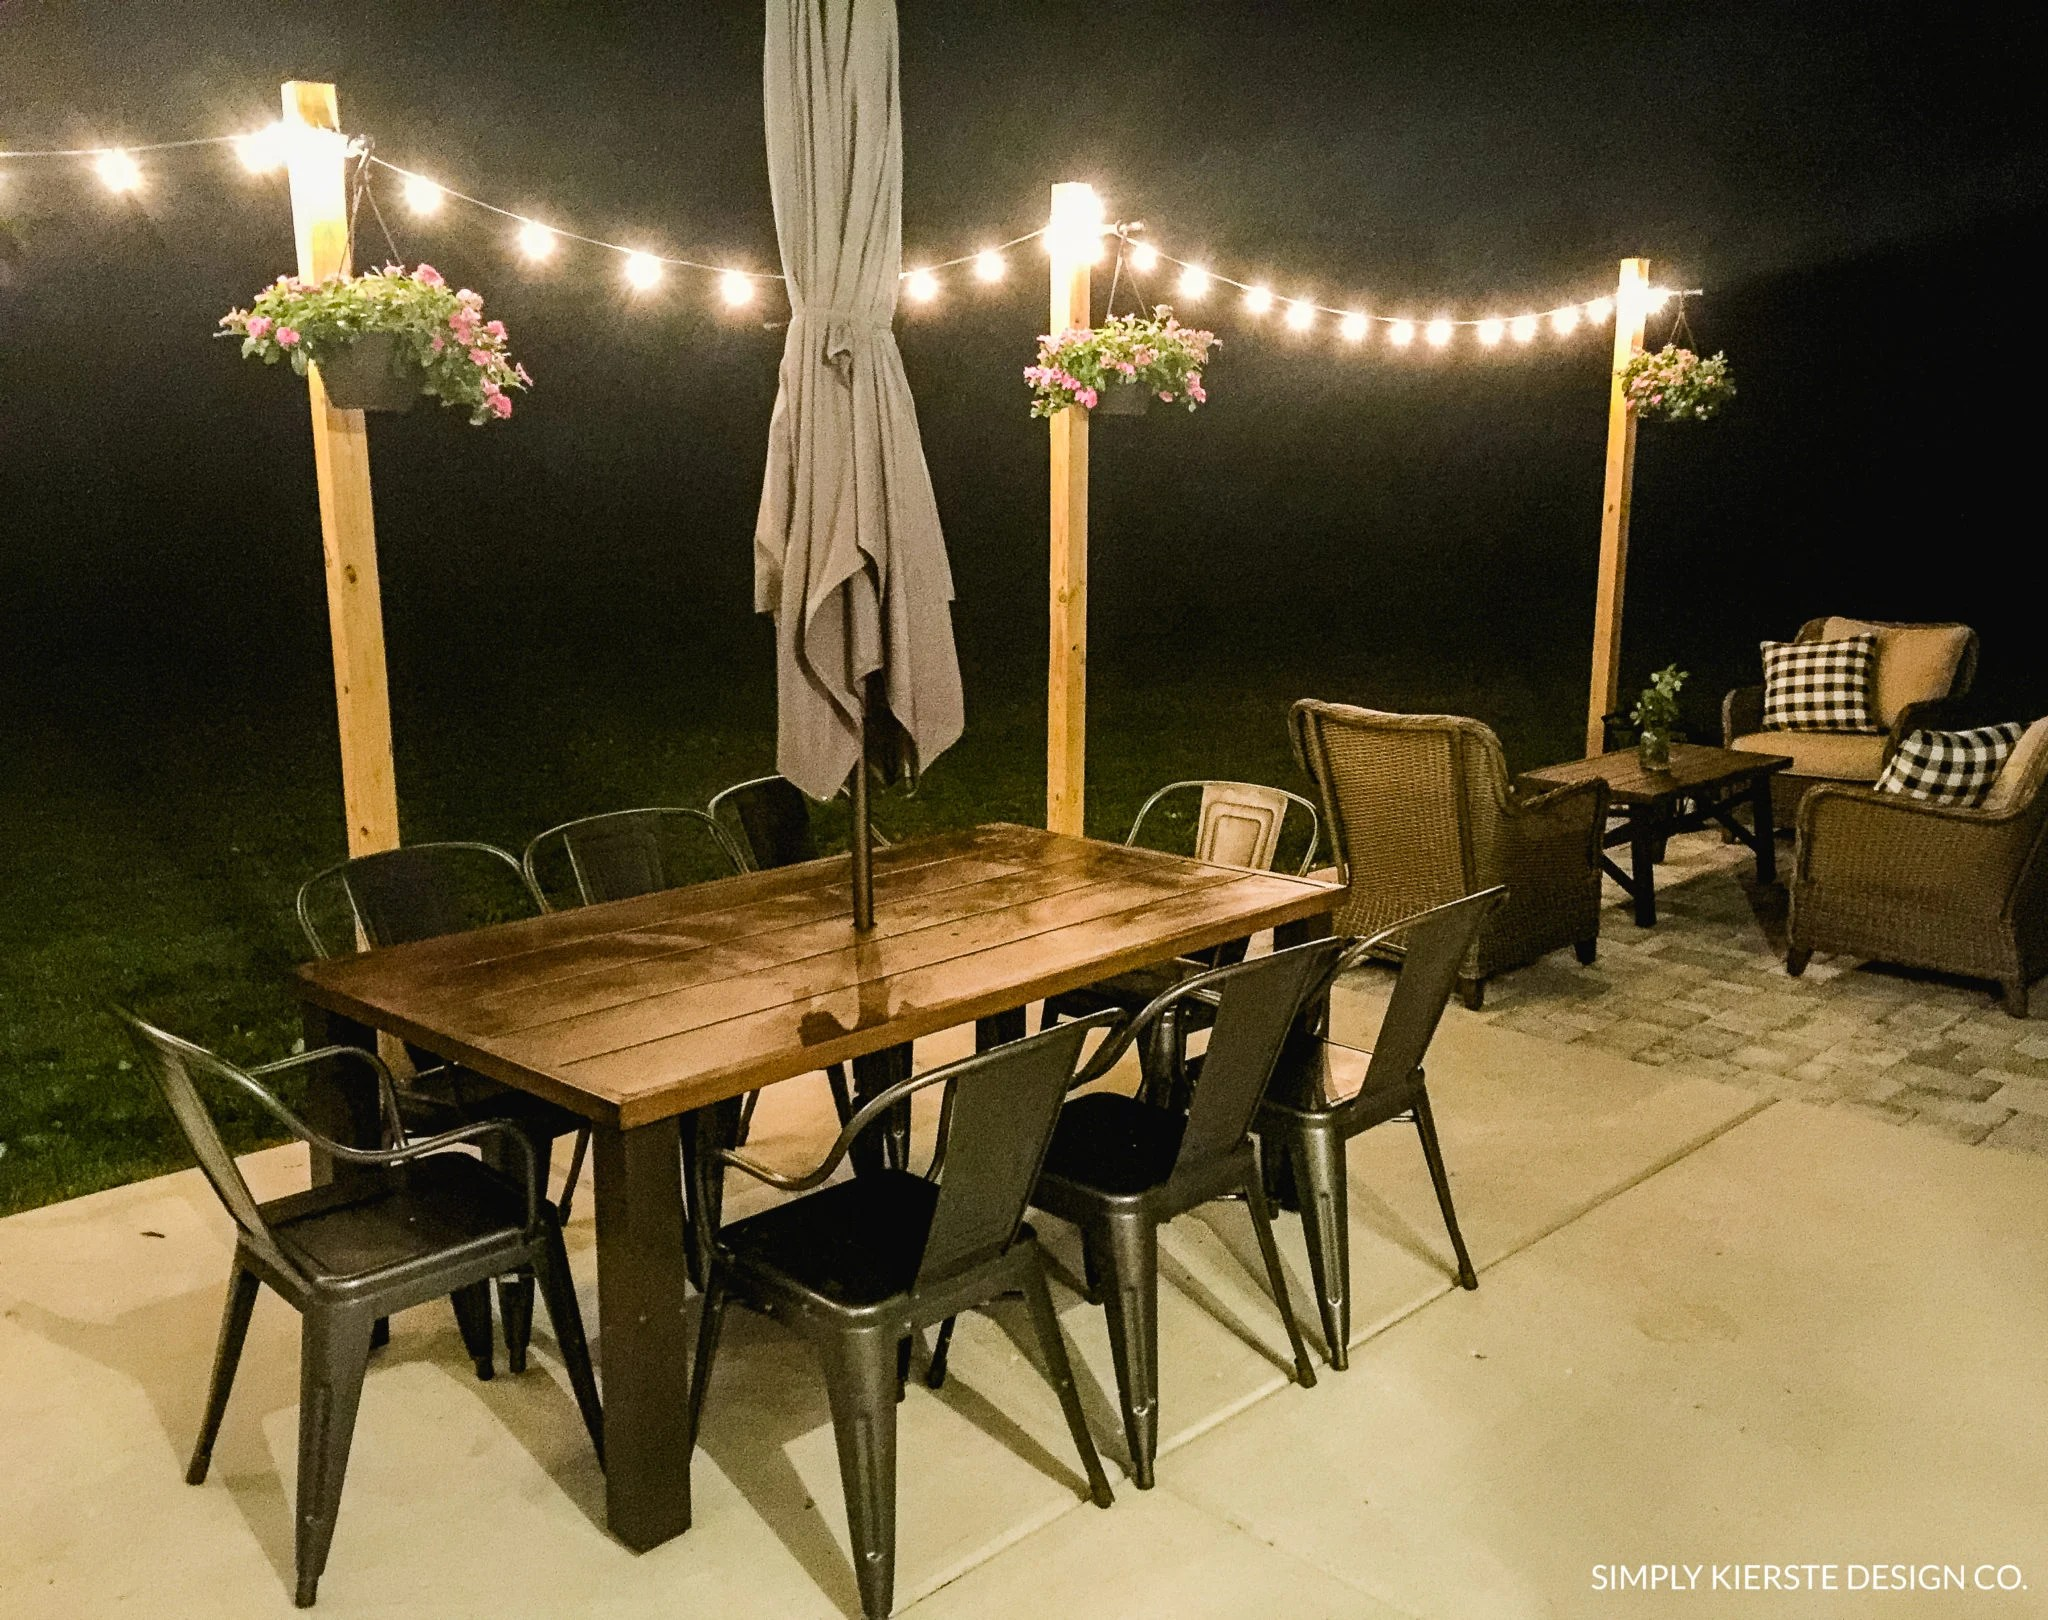 diy posts for outdoor string lights